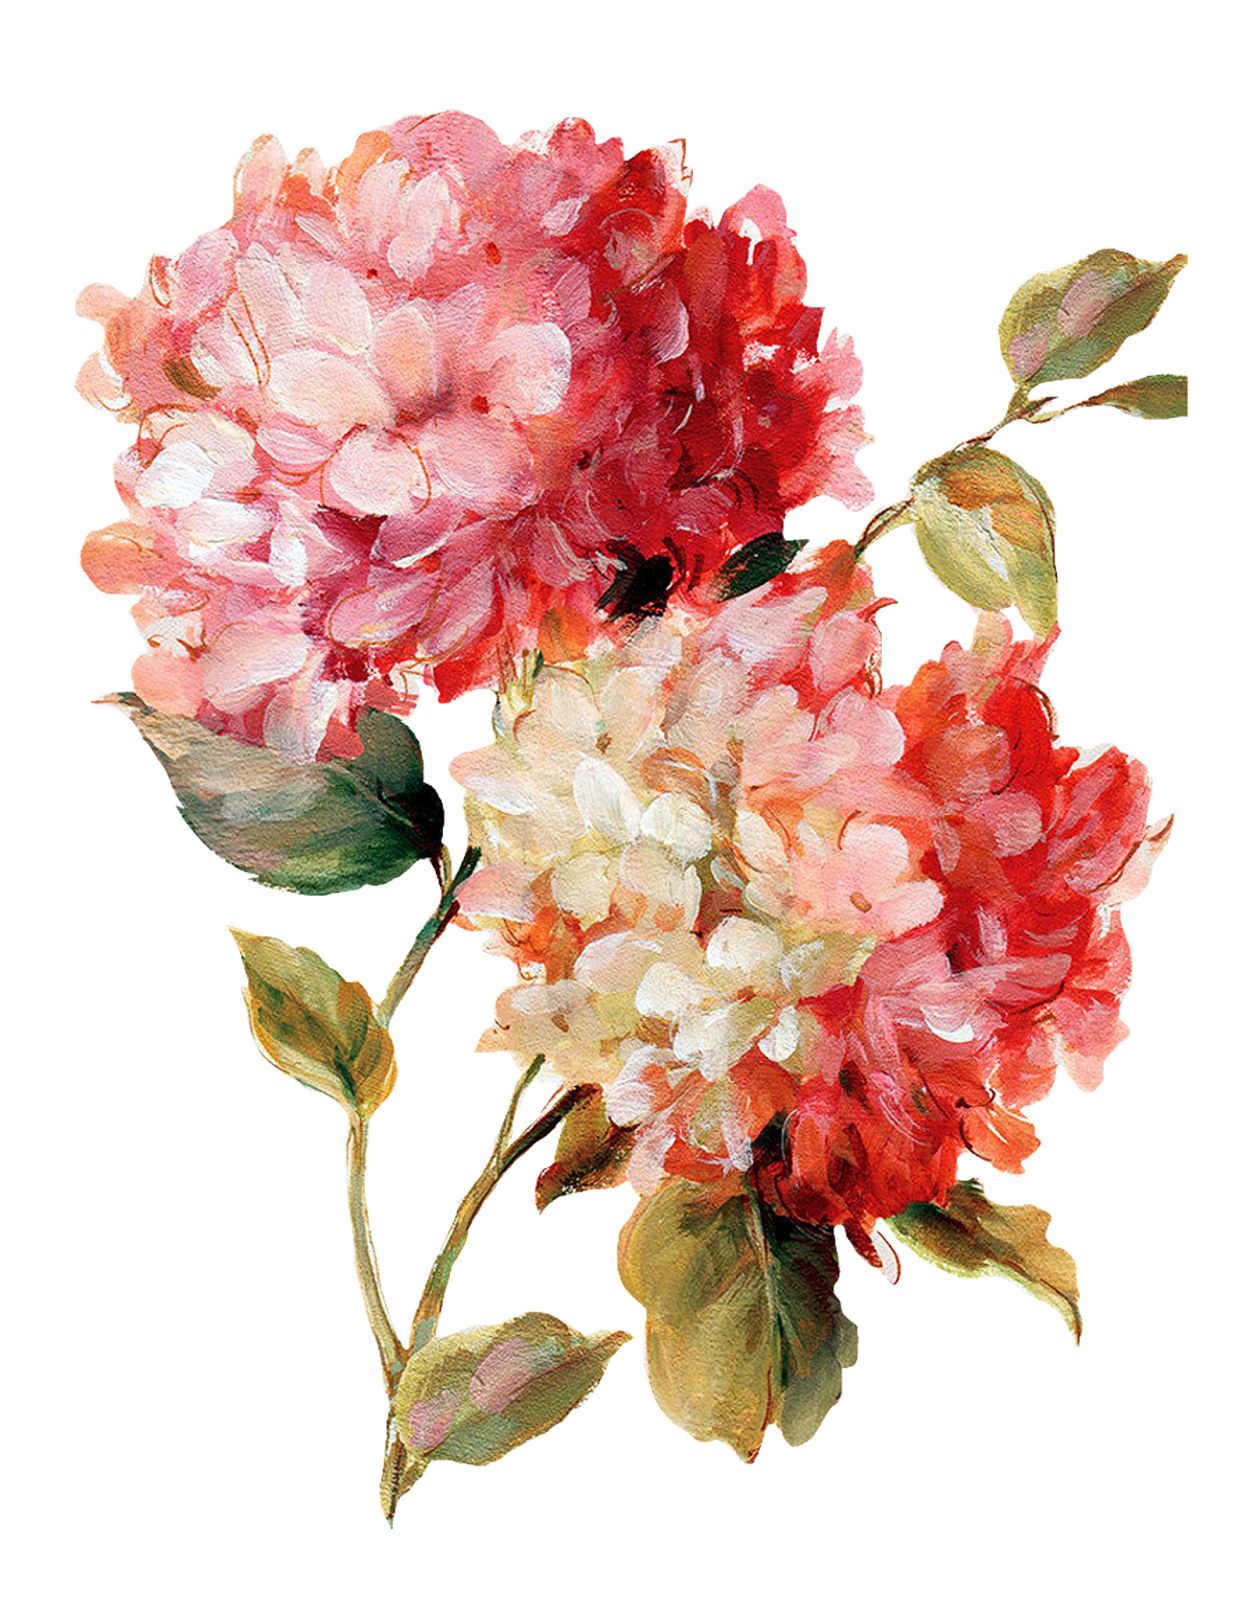 Flower Painting By Lisa Audit Png 69 Item Joy Design